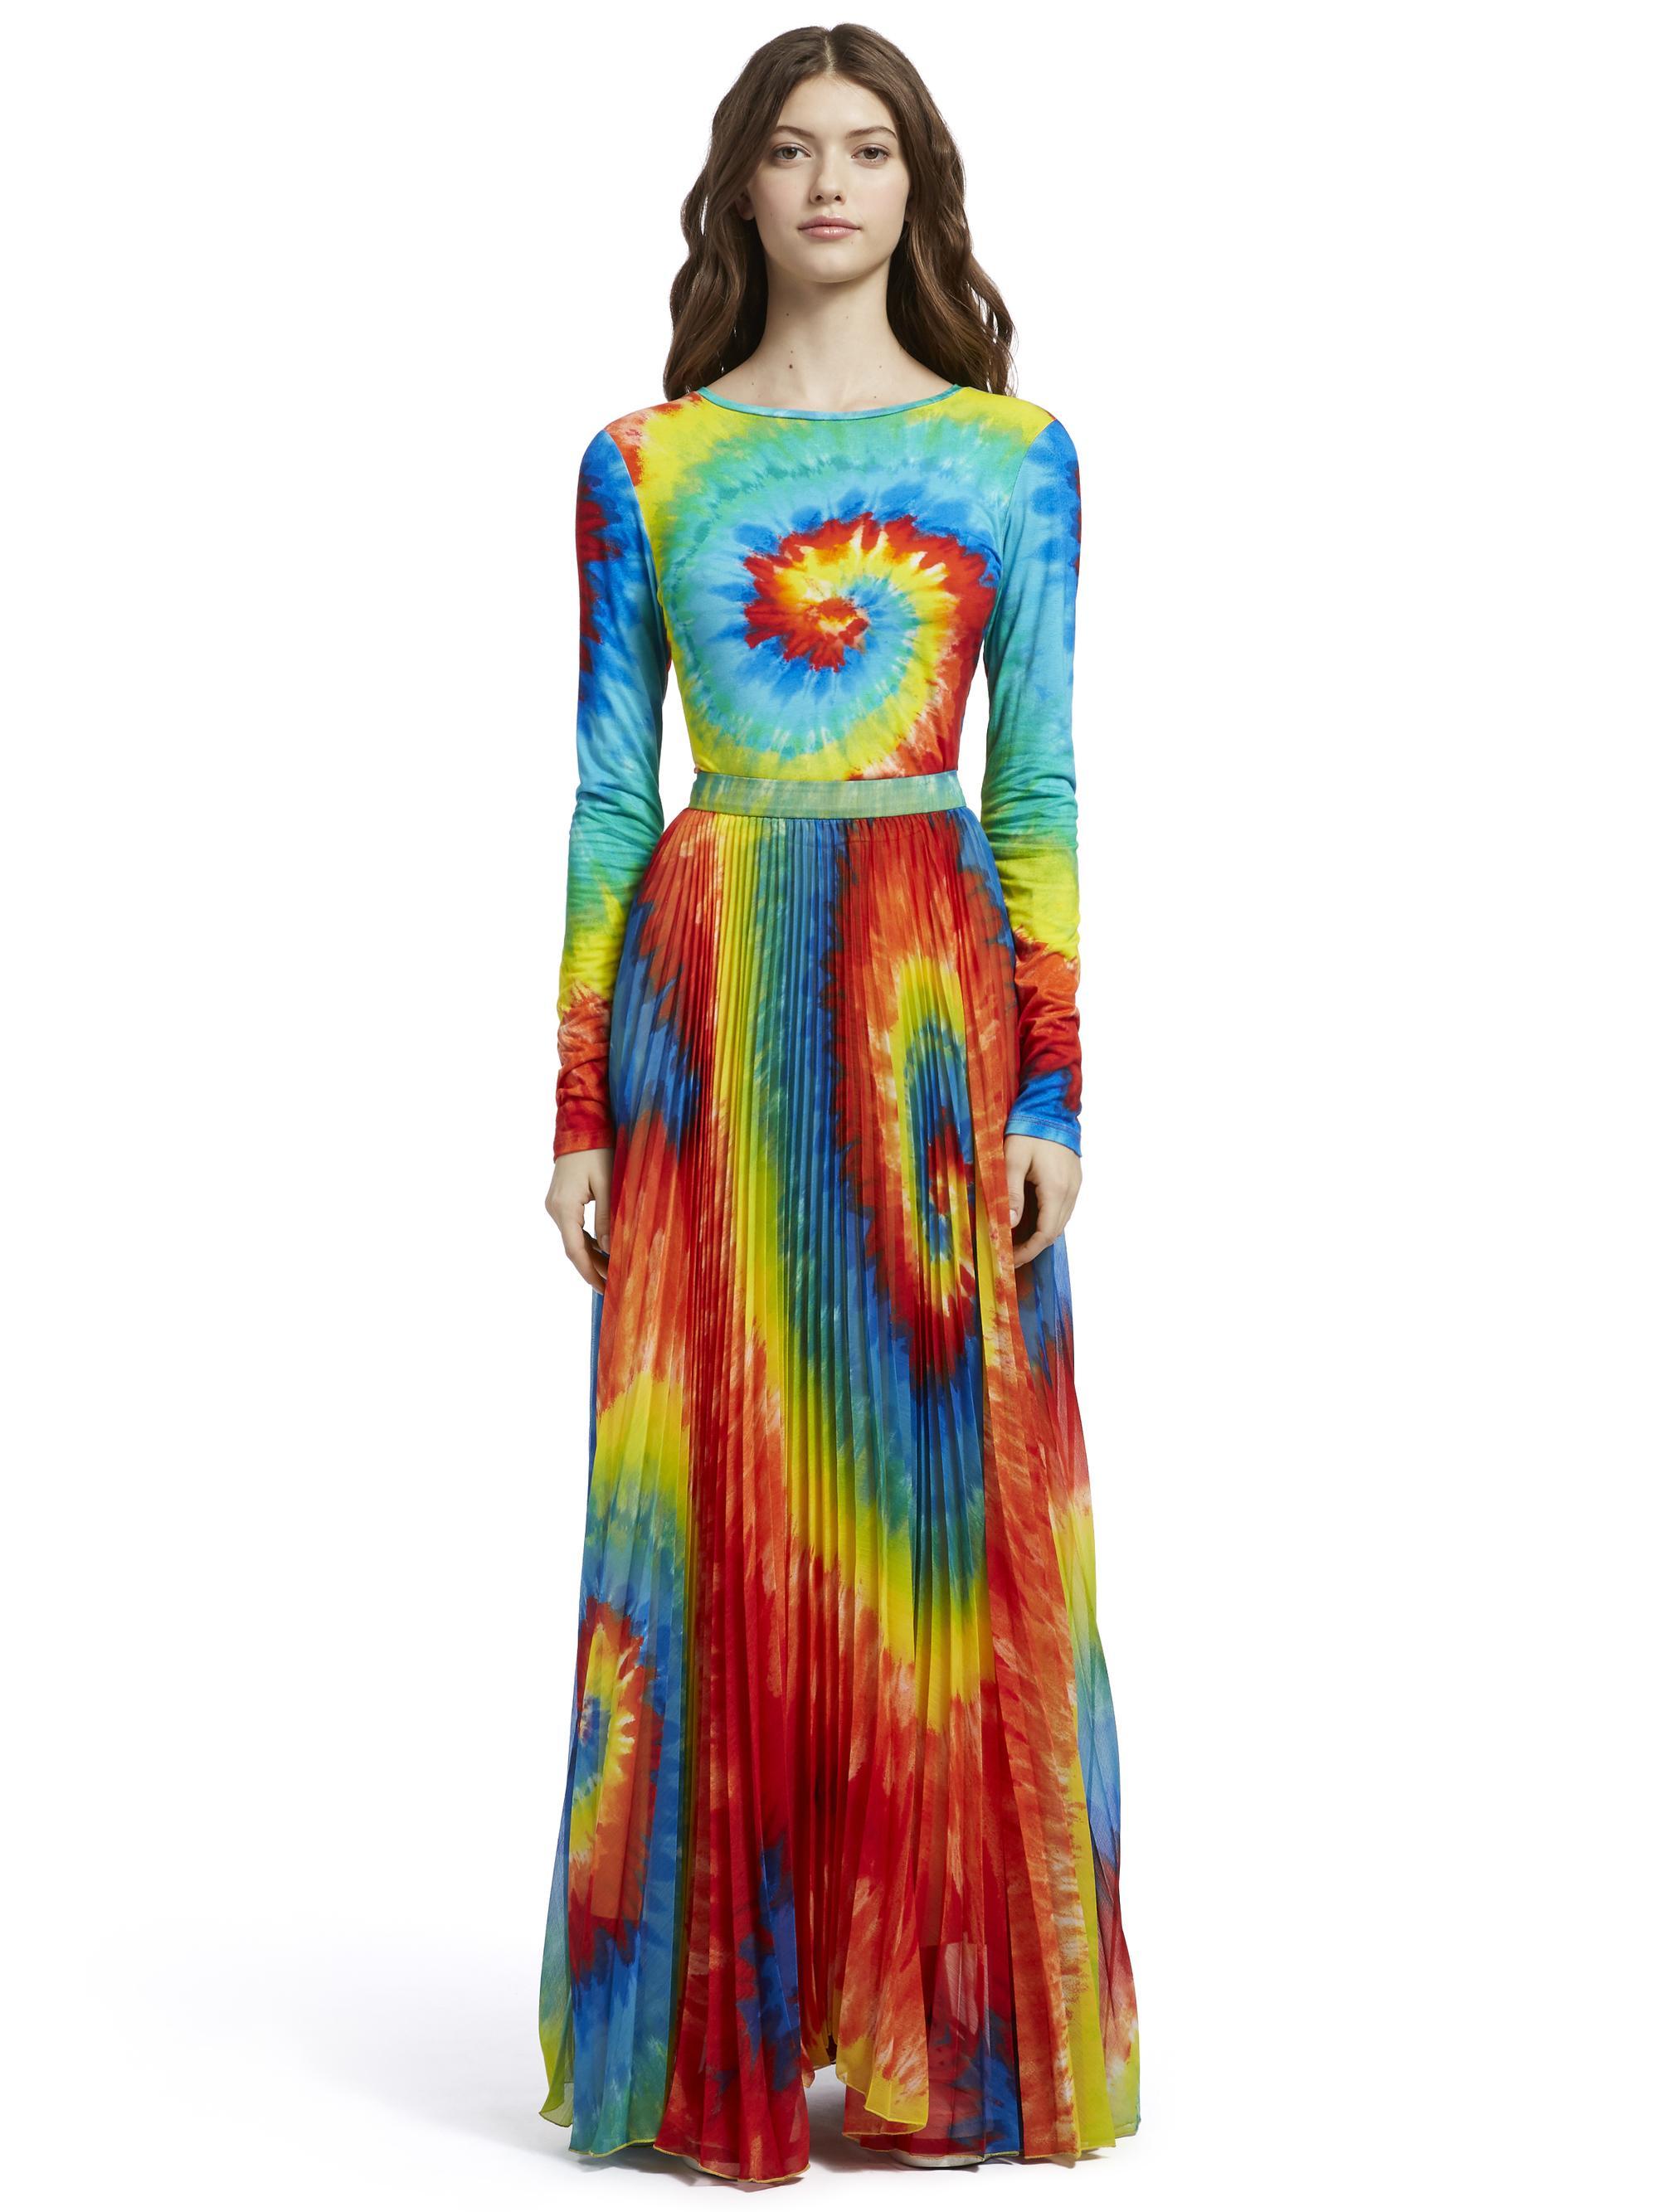 5d6473e39c68d Alice + Olivia. Women s Delaina Tie Dye Crop Top